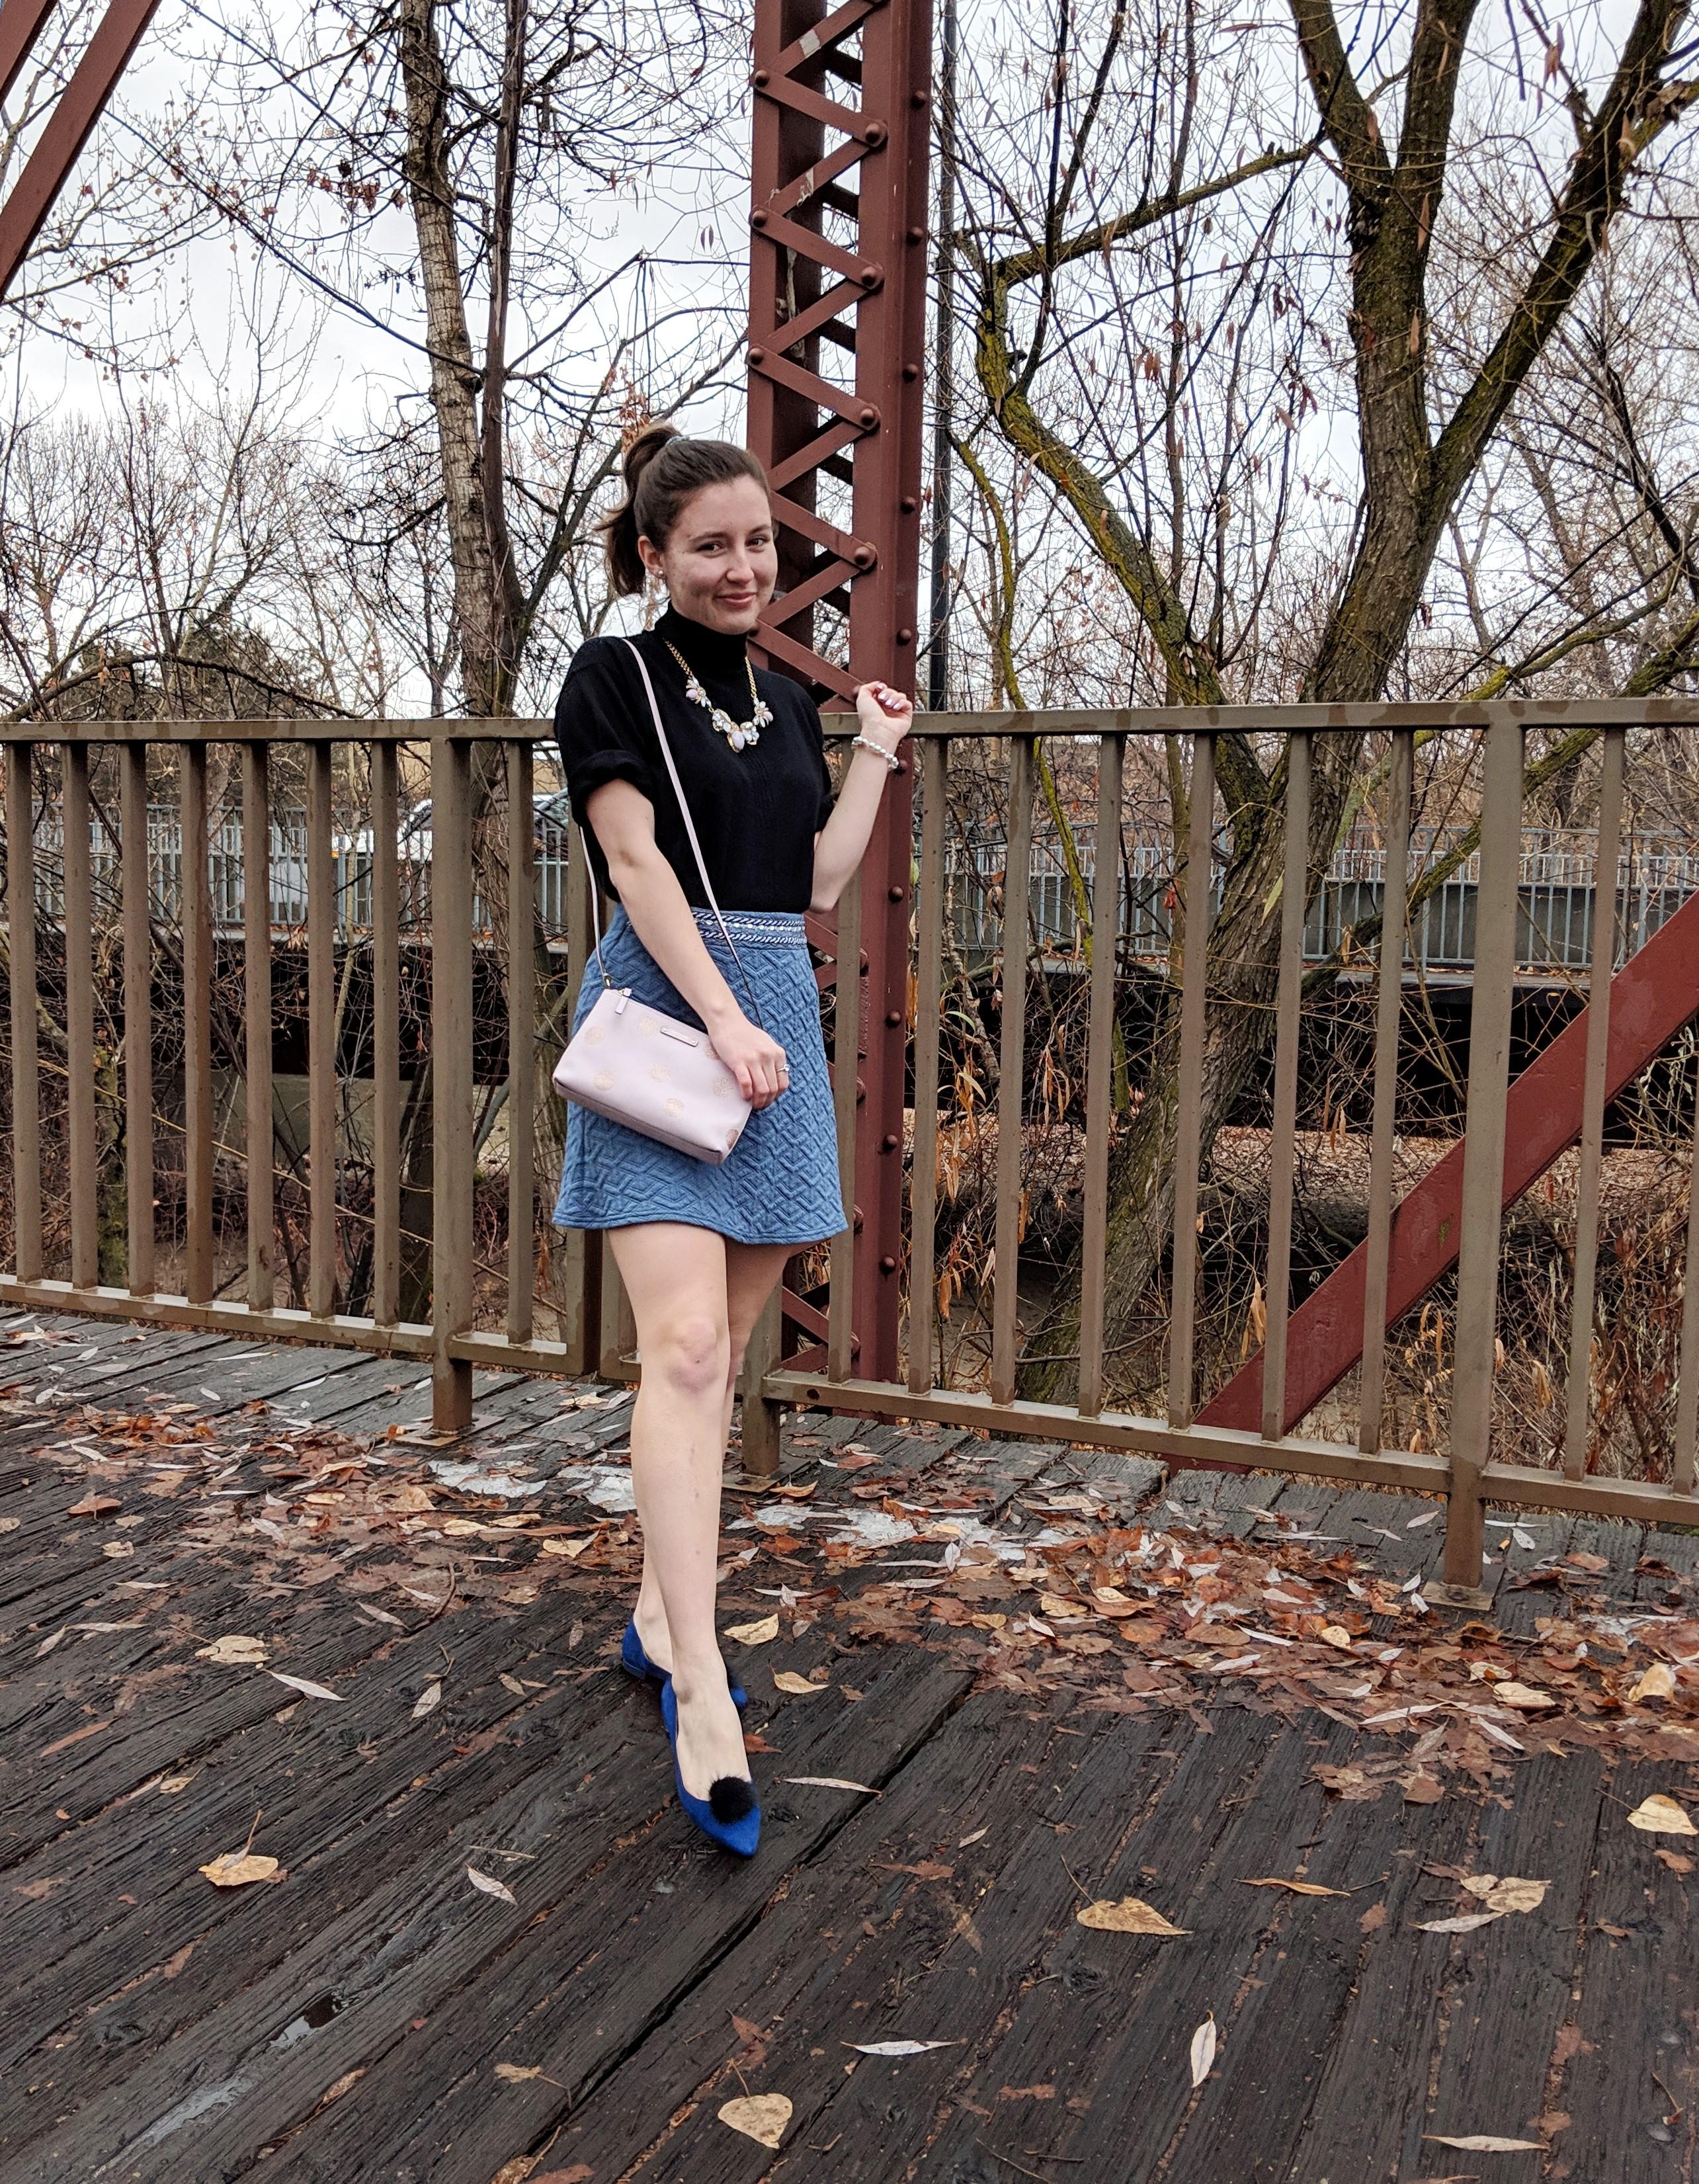 blue flats with black pom pom shoe clips